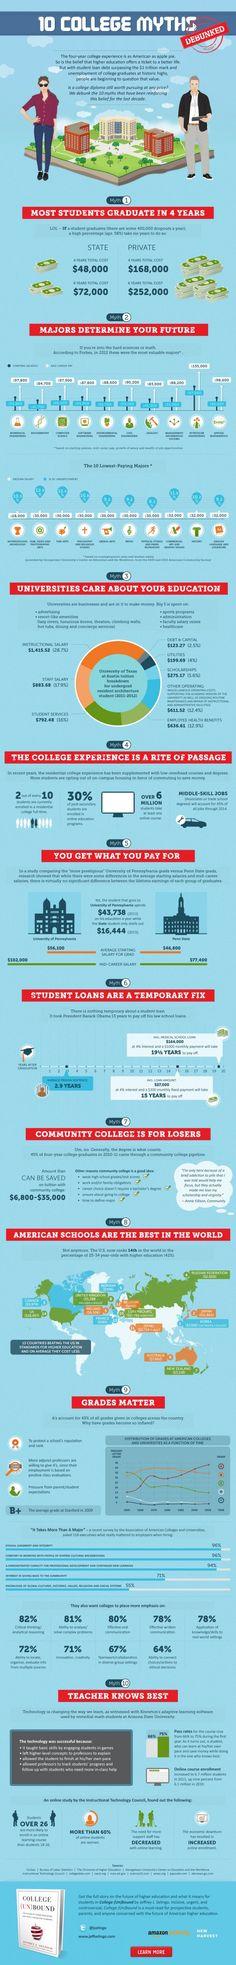 College (Un)bound: 10 College Myths Debunked